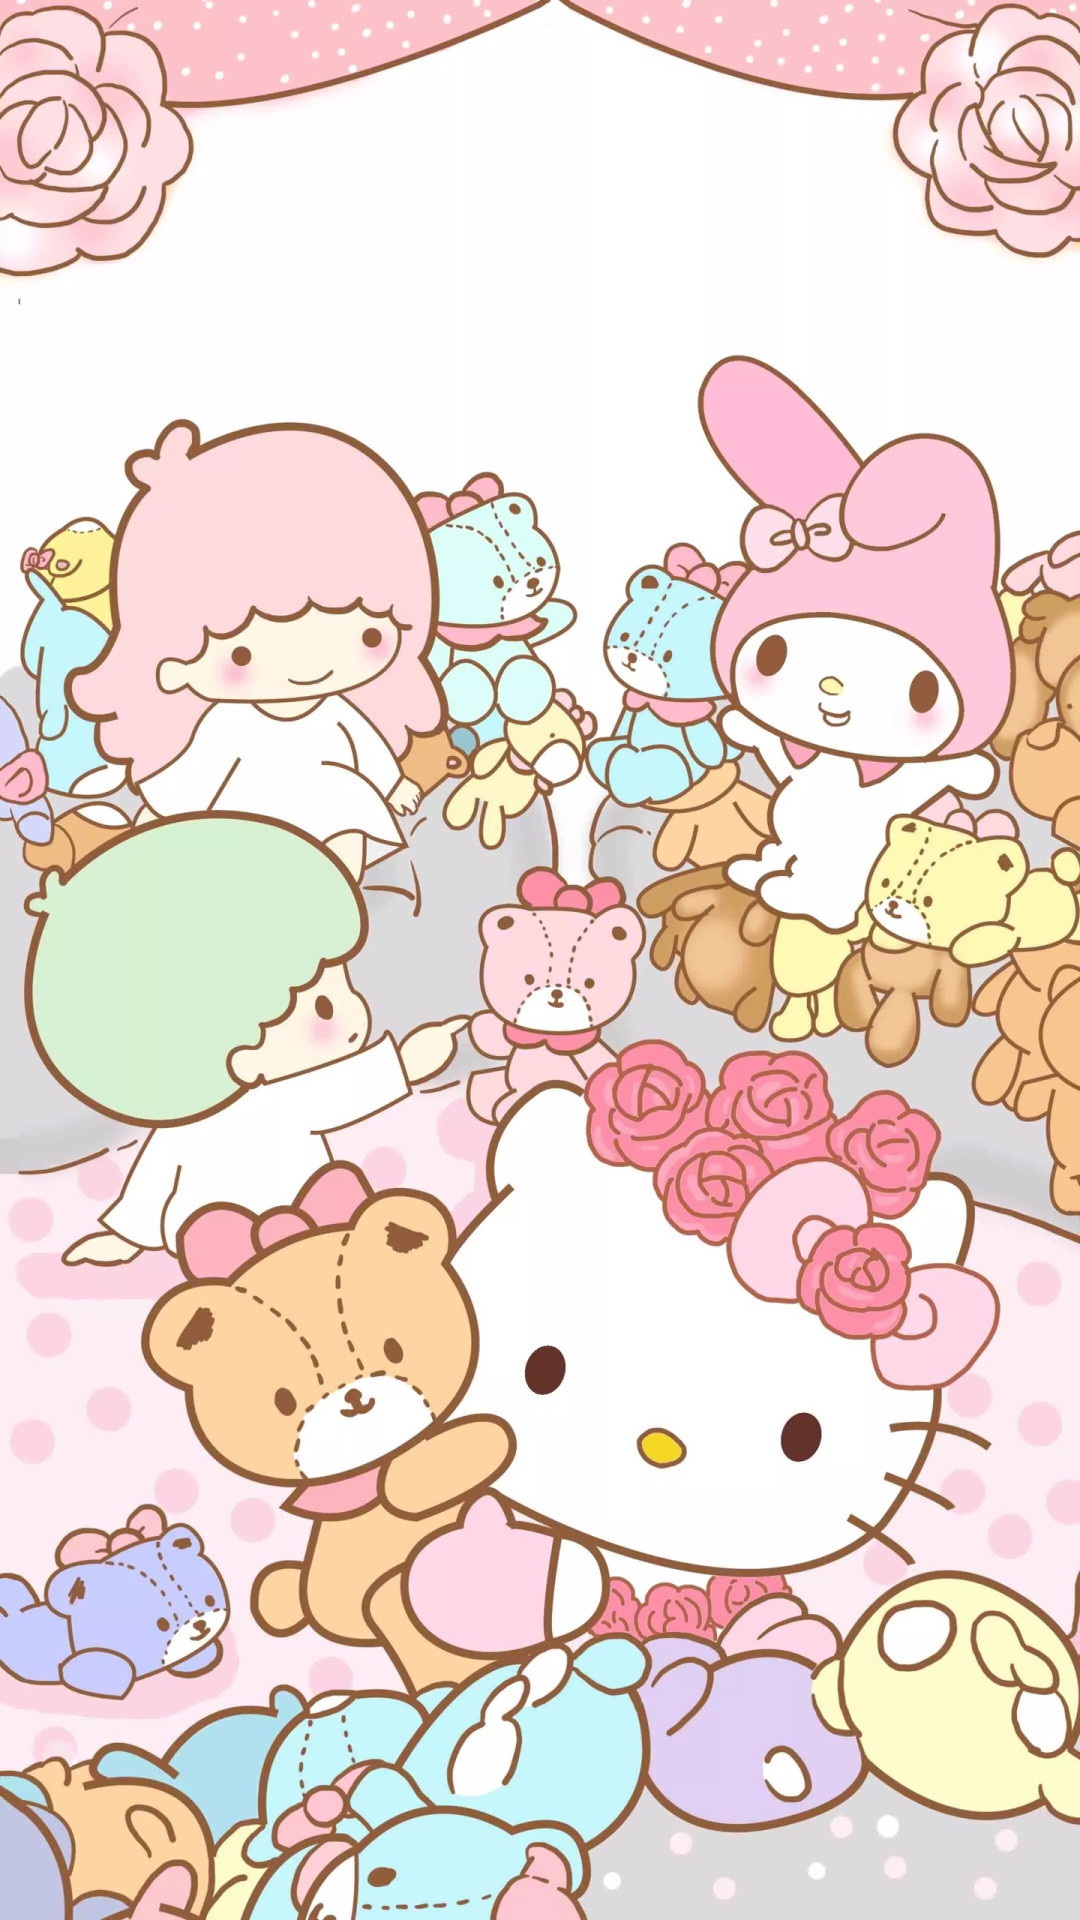 Sanrio wallpaper